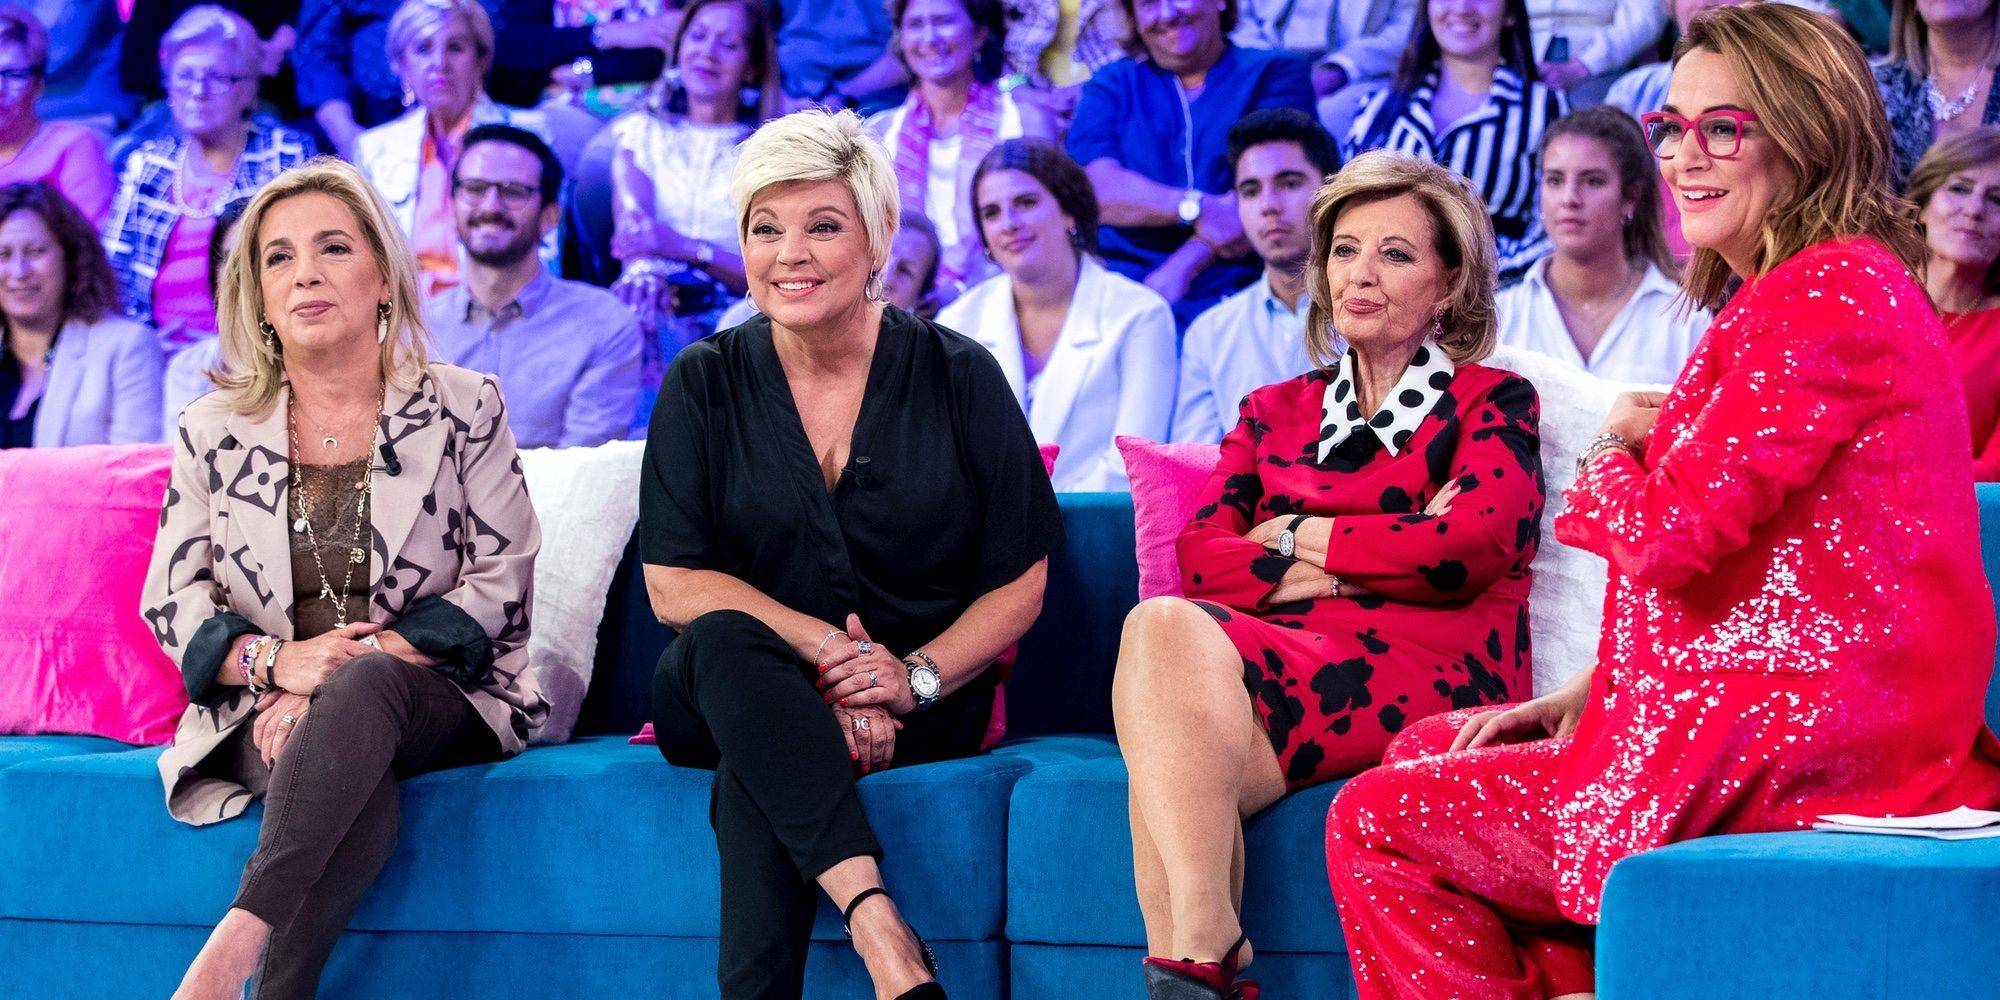 Terelu Campos vuelve a Telemadrid acompañada por María Teresa Campos y Carmen Borrego